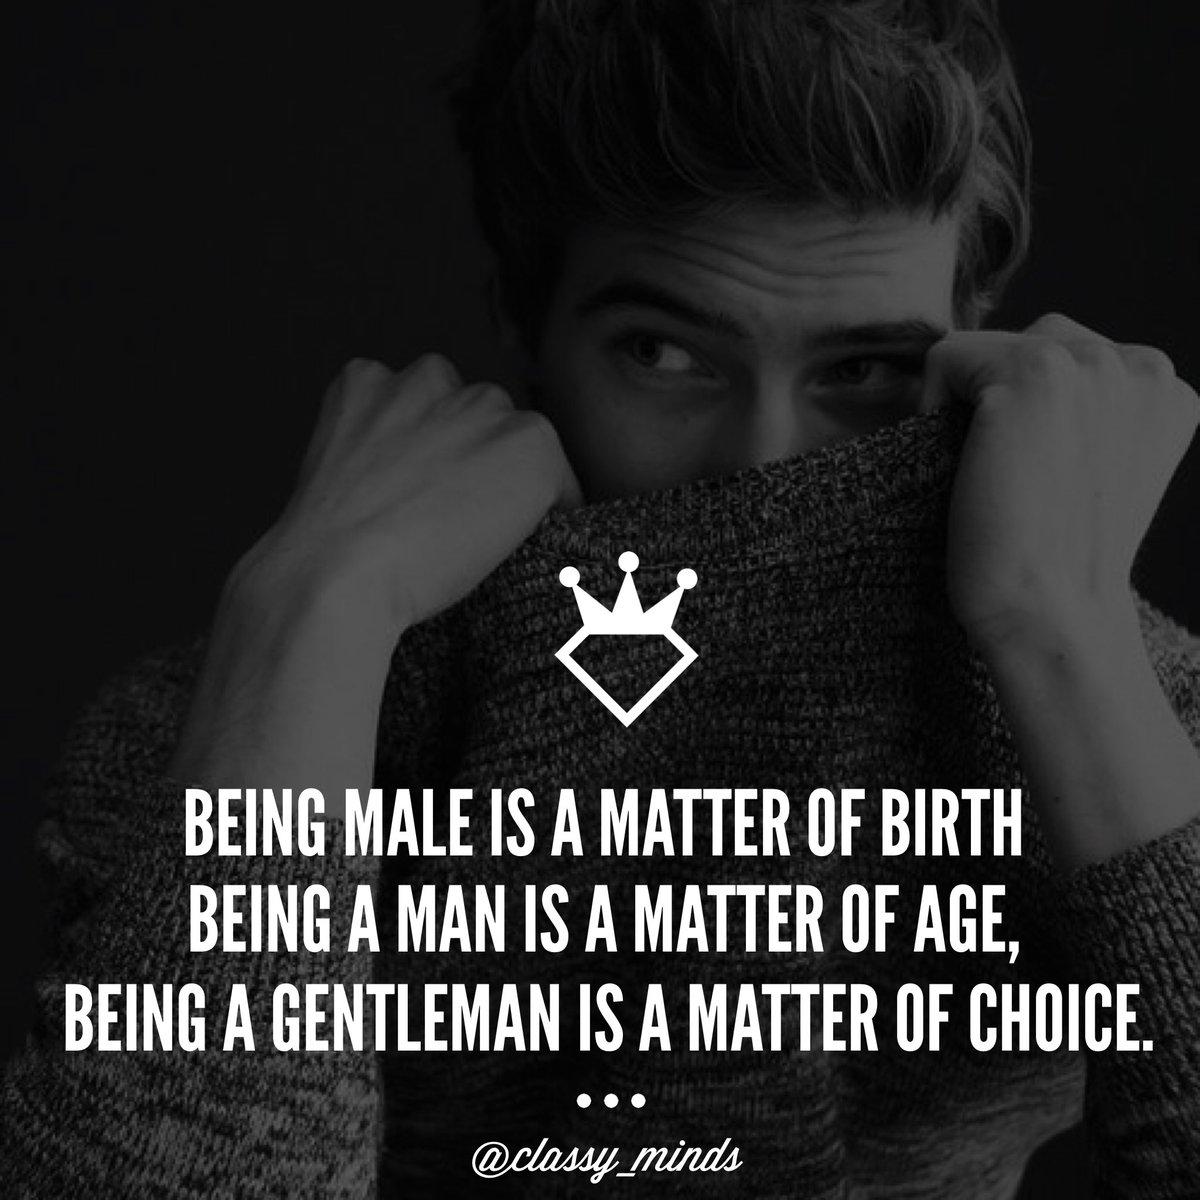 Classy minds on twitter quote quotes india usa beautiful quoteoftheday millionaire luxury billionairemindset rich girls boys kiss romantic